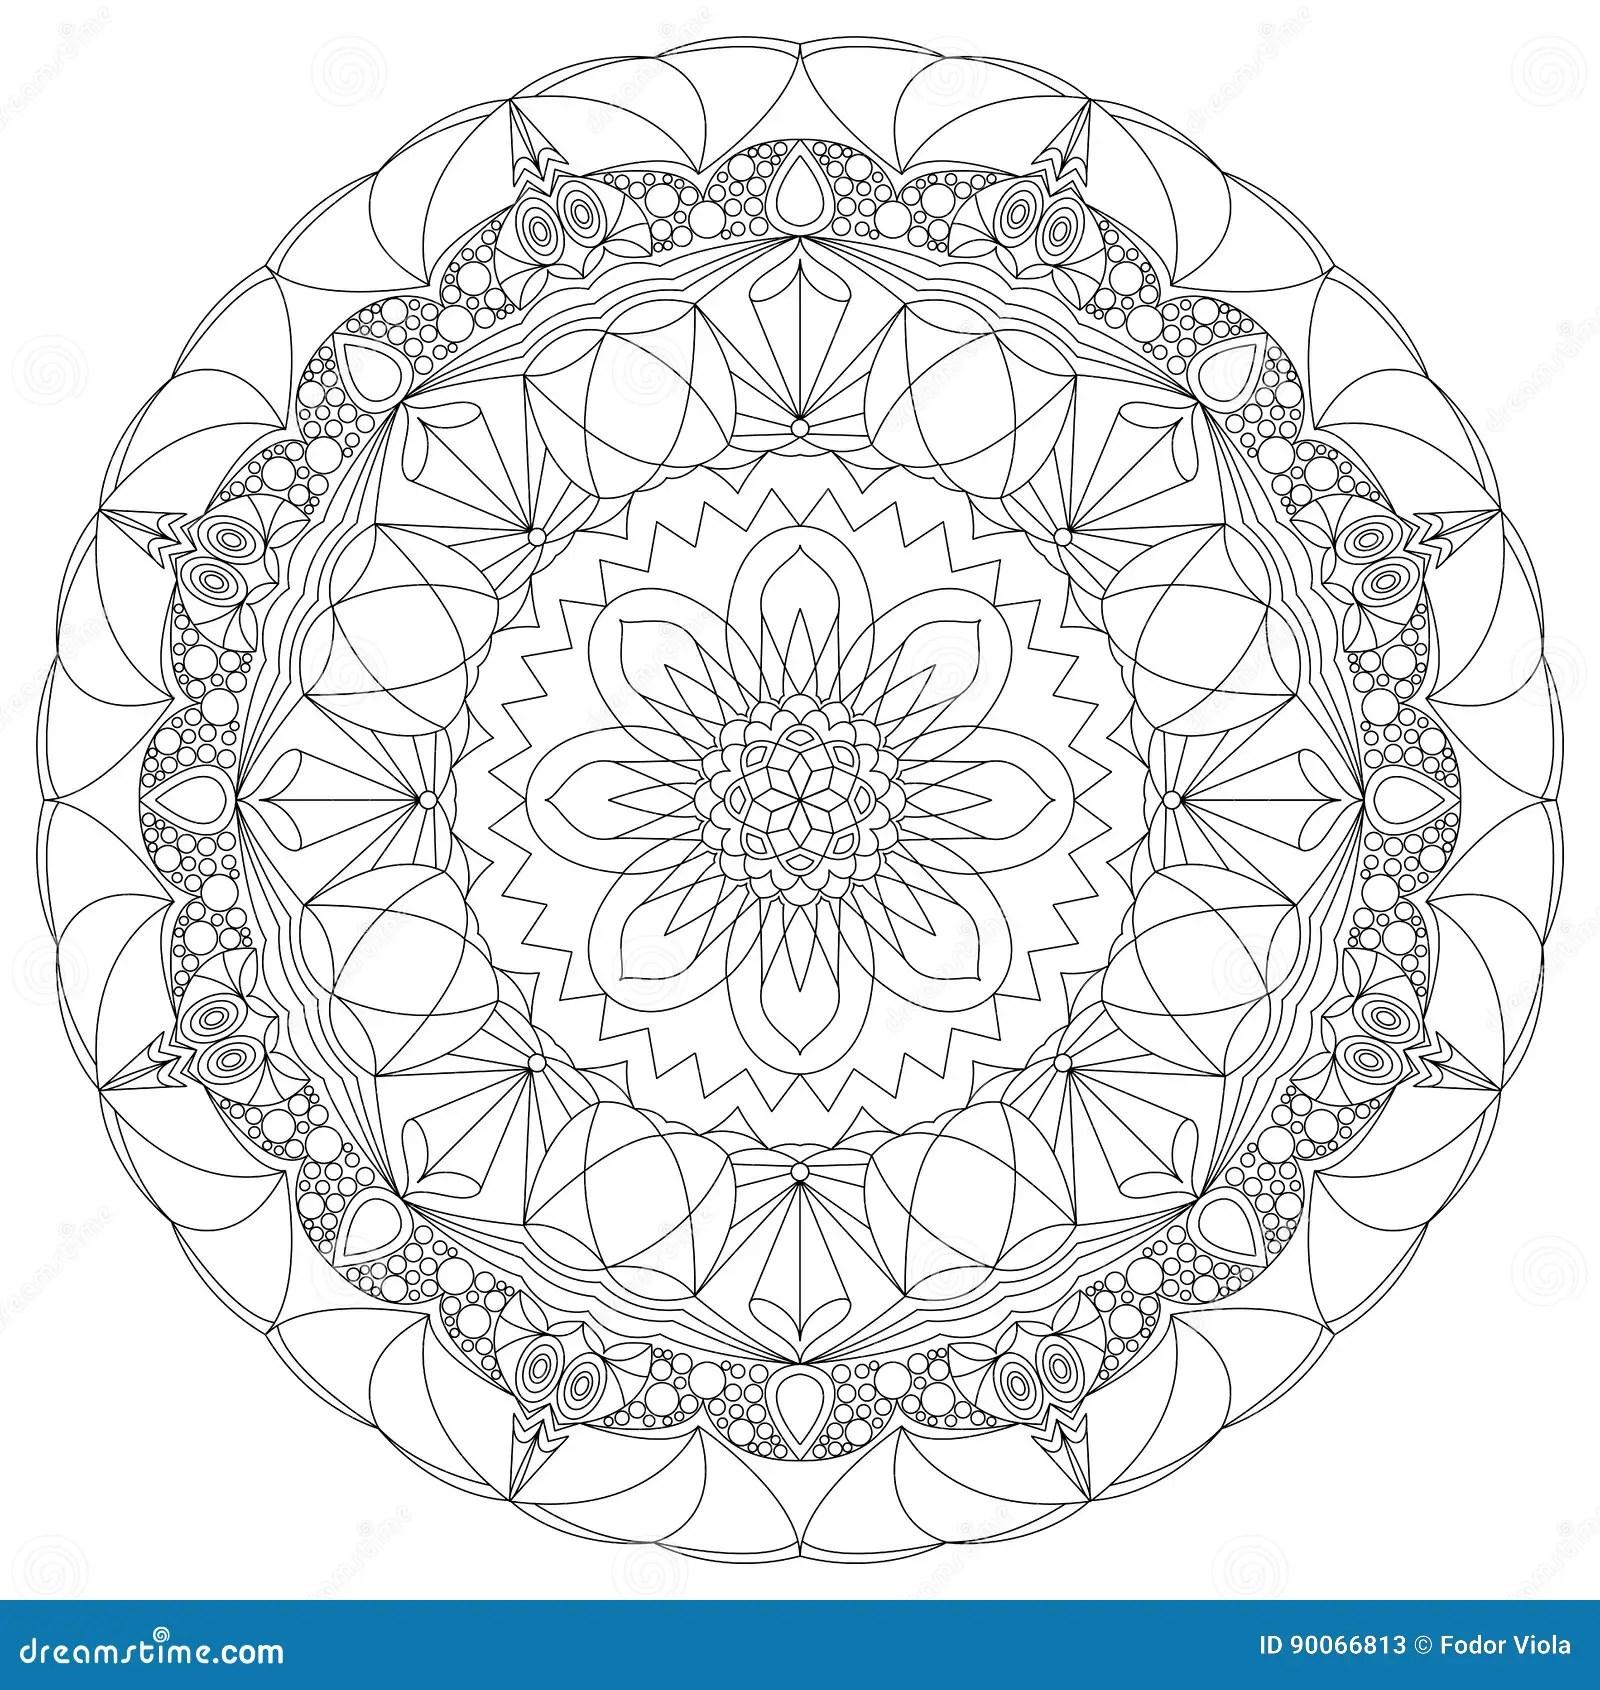 Sida For Farglaggning For Harlig Cirkelmandala Vuxen